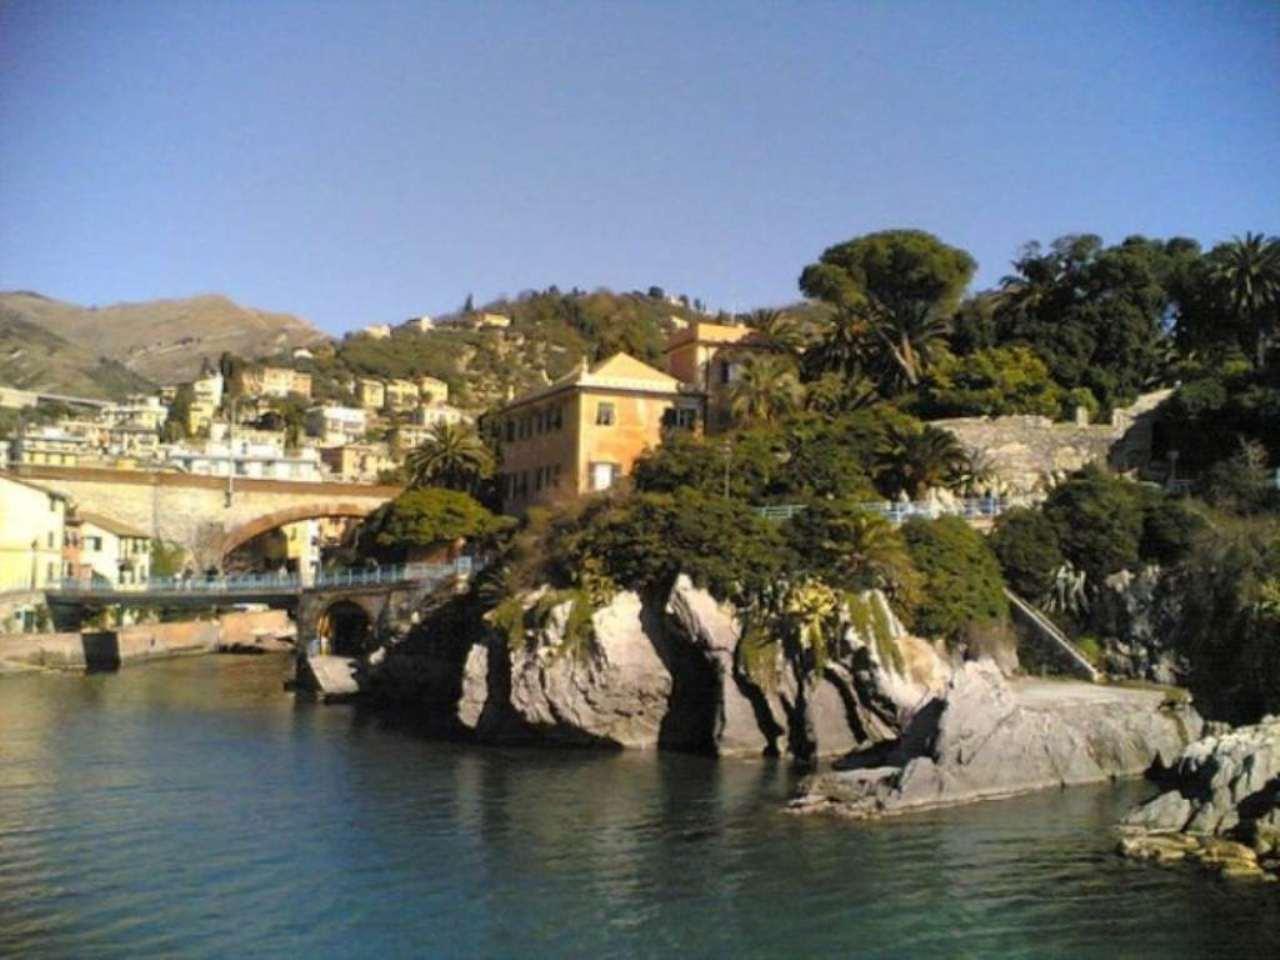 Bilocale Genova Via Felice Gazzolo 2